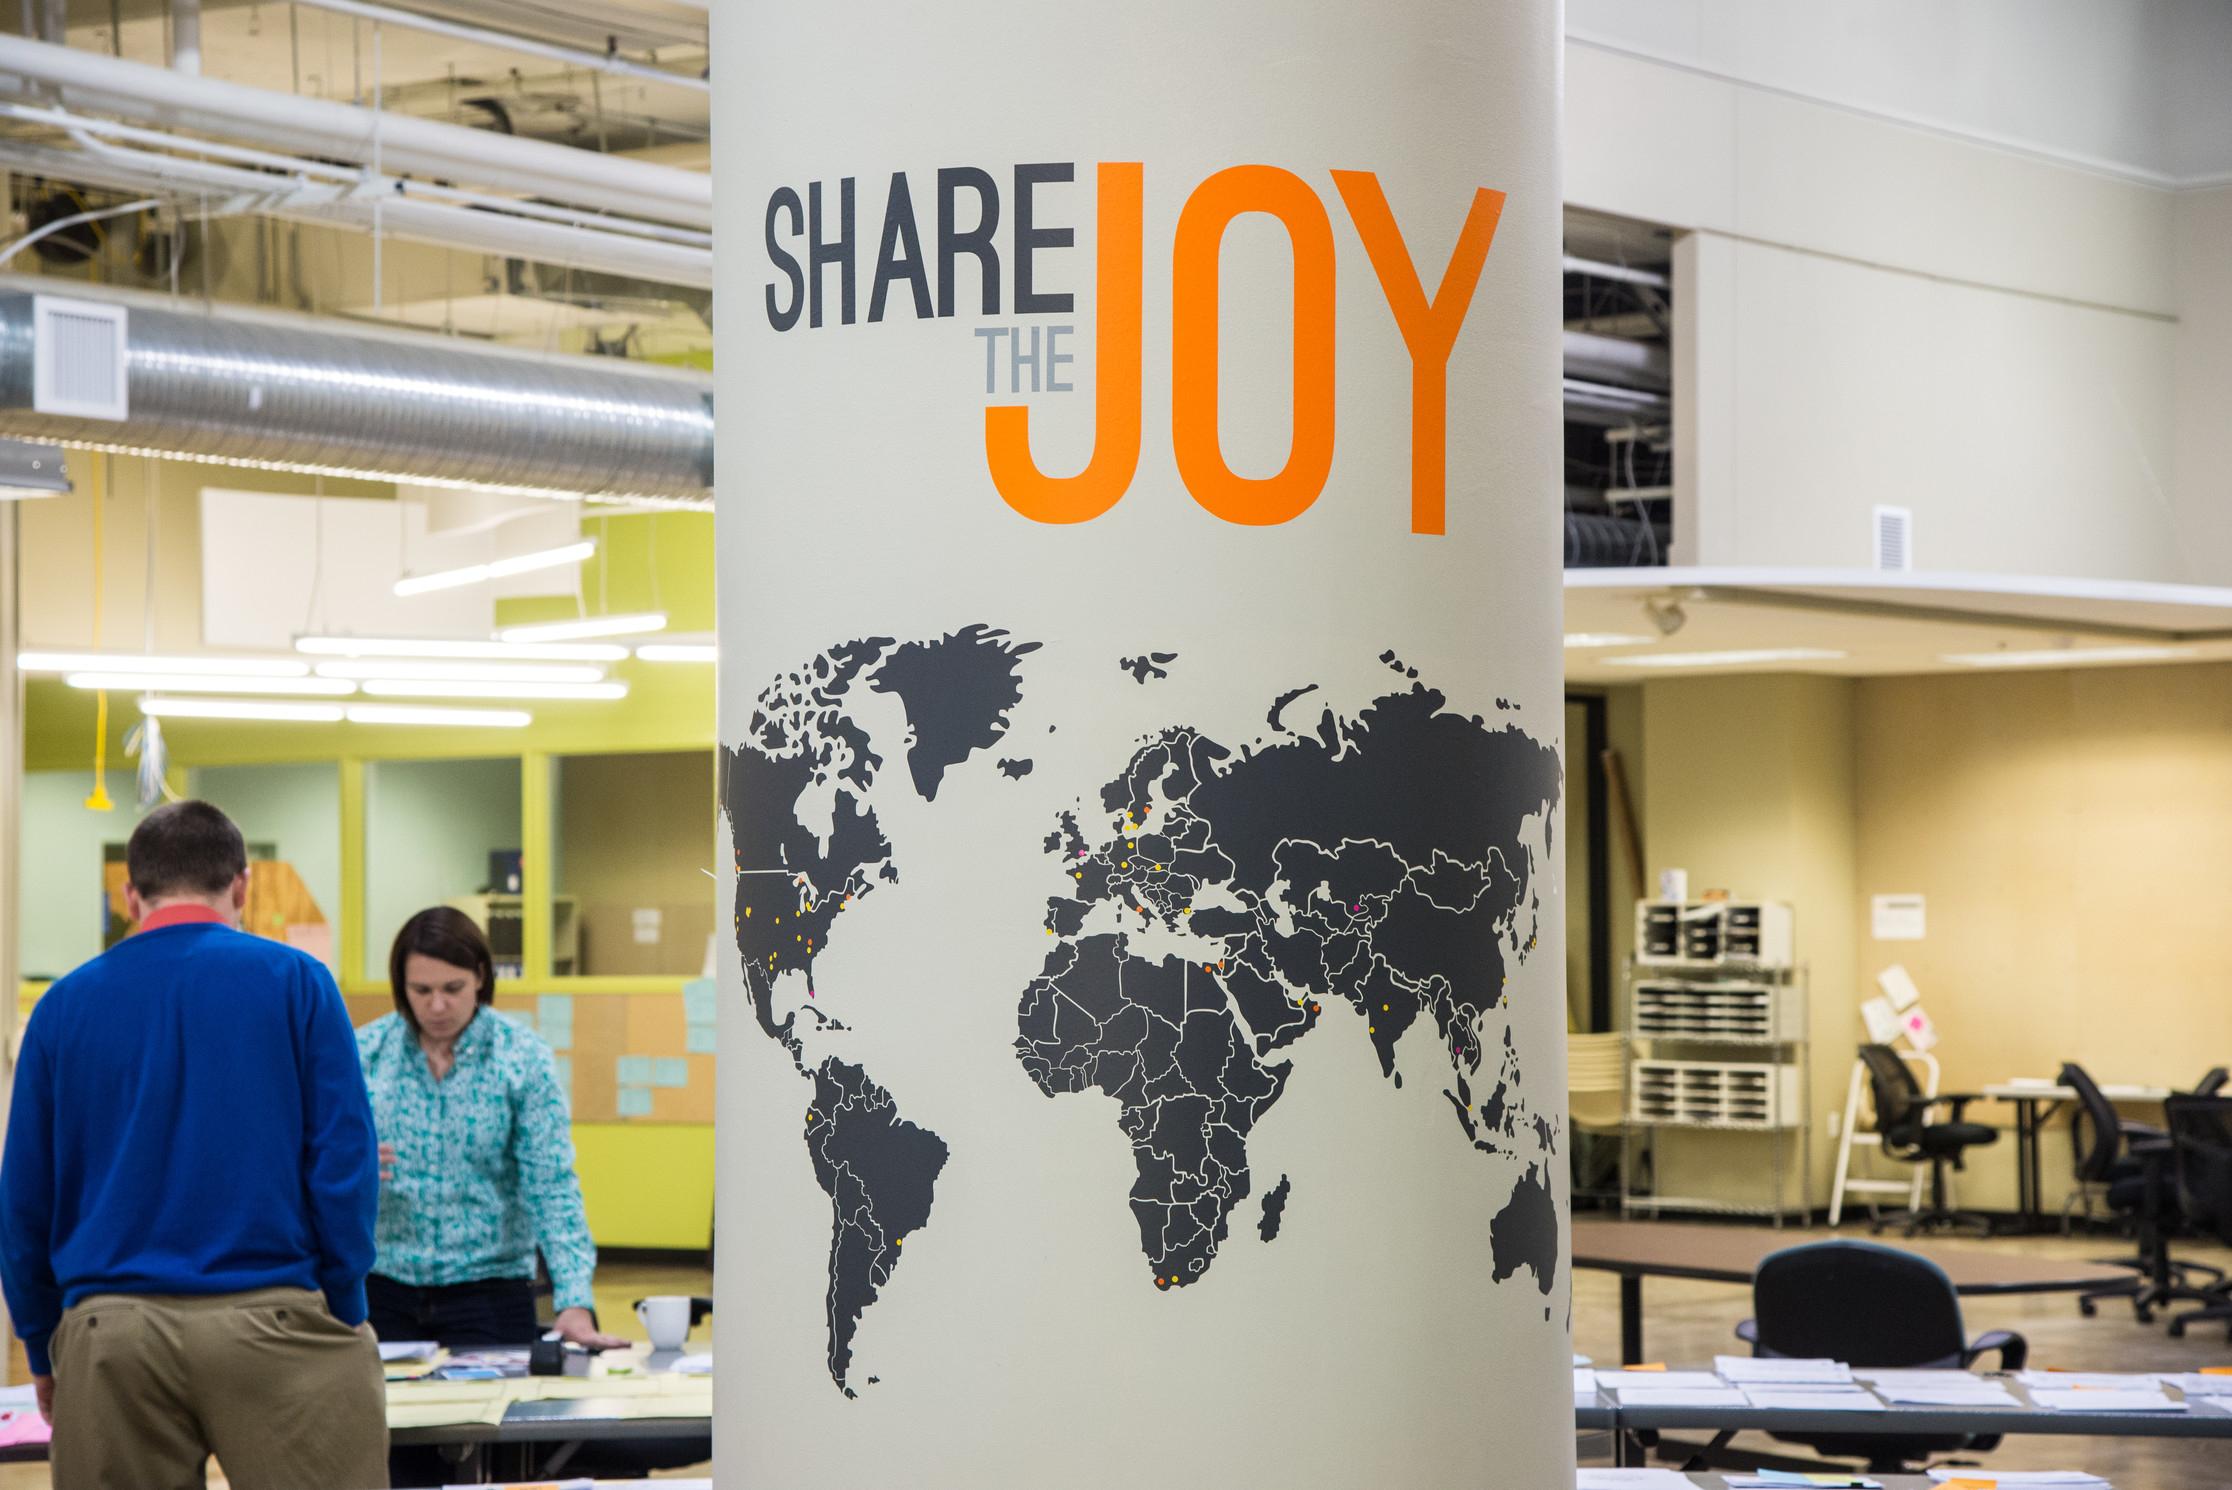 Share the Joy Image